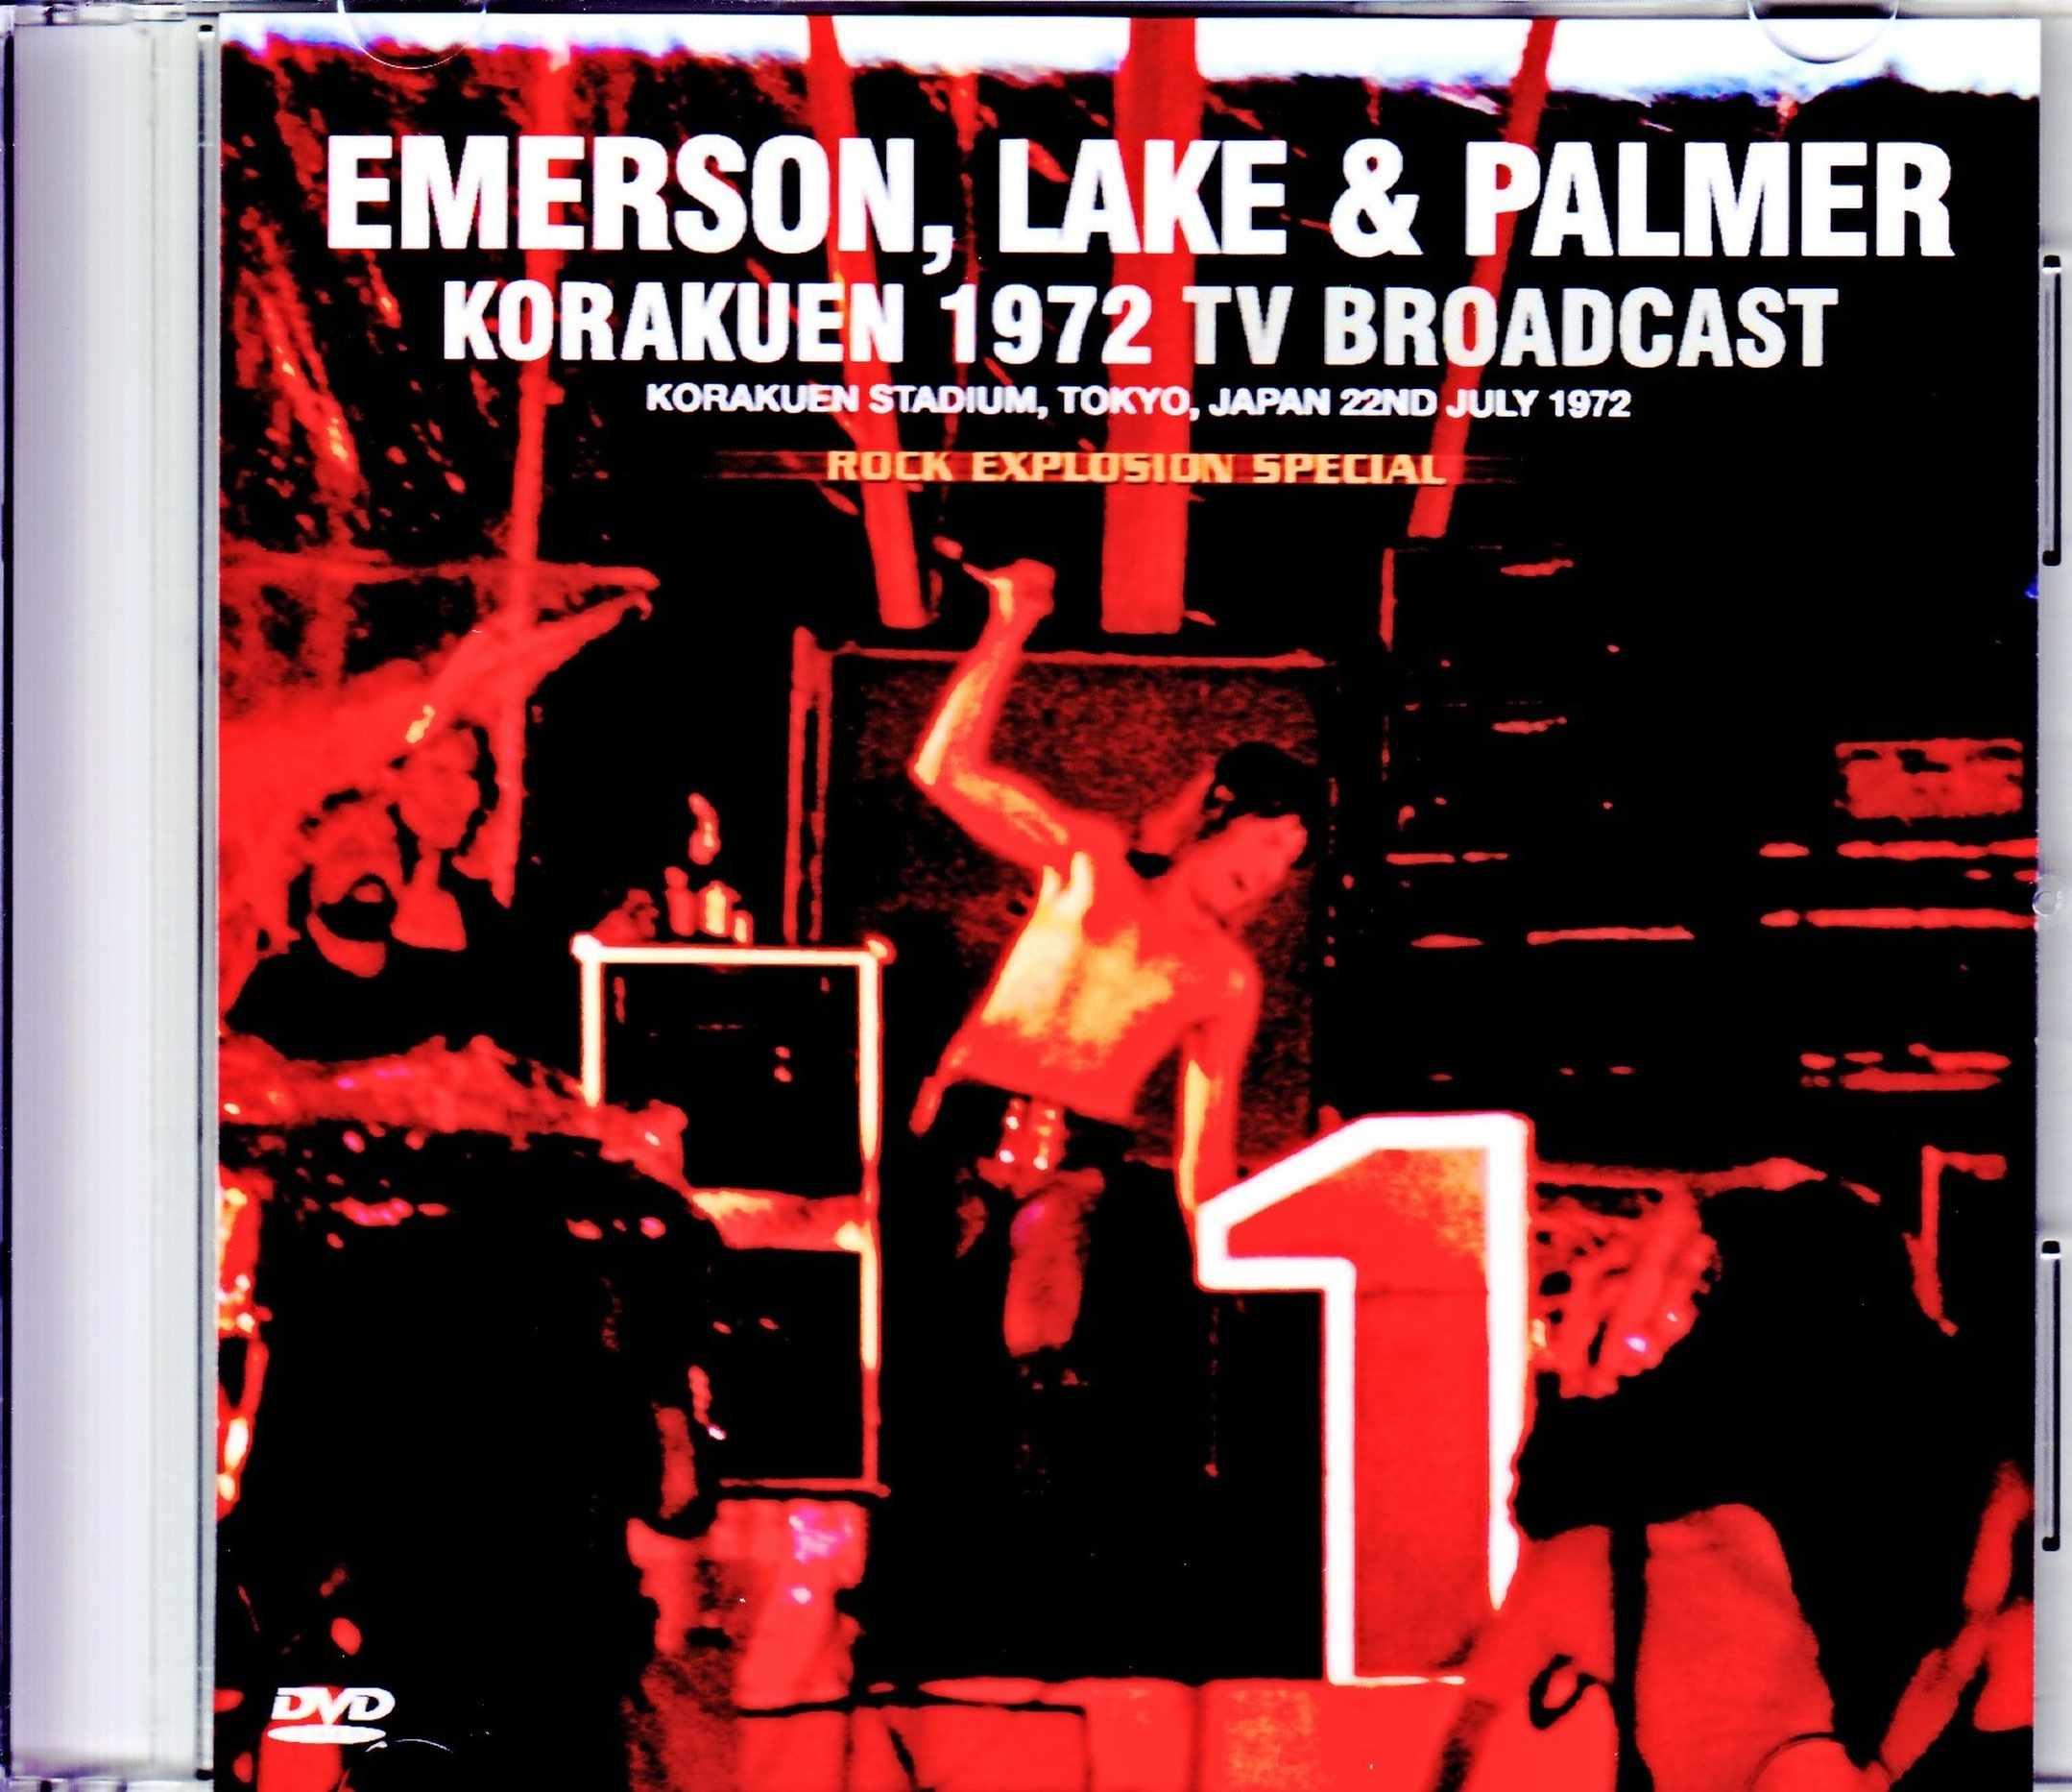 EL & P Emerson,Lake & Palmer エマーソン・レイク・アンド・パーマー/Tokyo,Japan 7.22.1972 Japanese Broadcast Edition